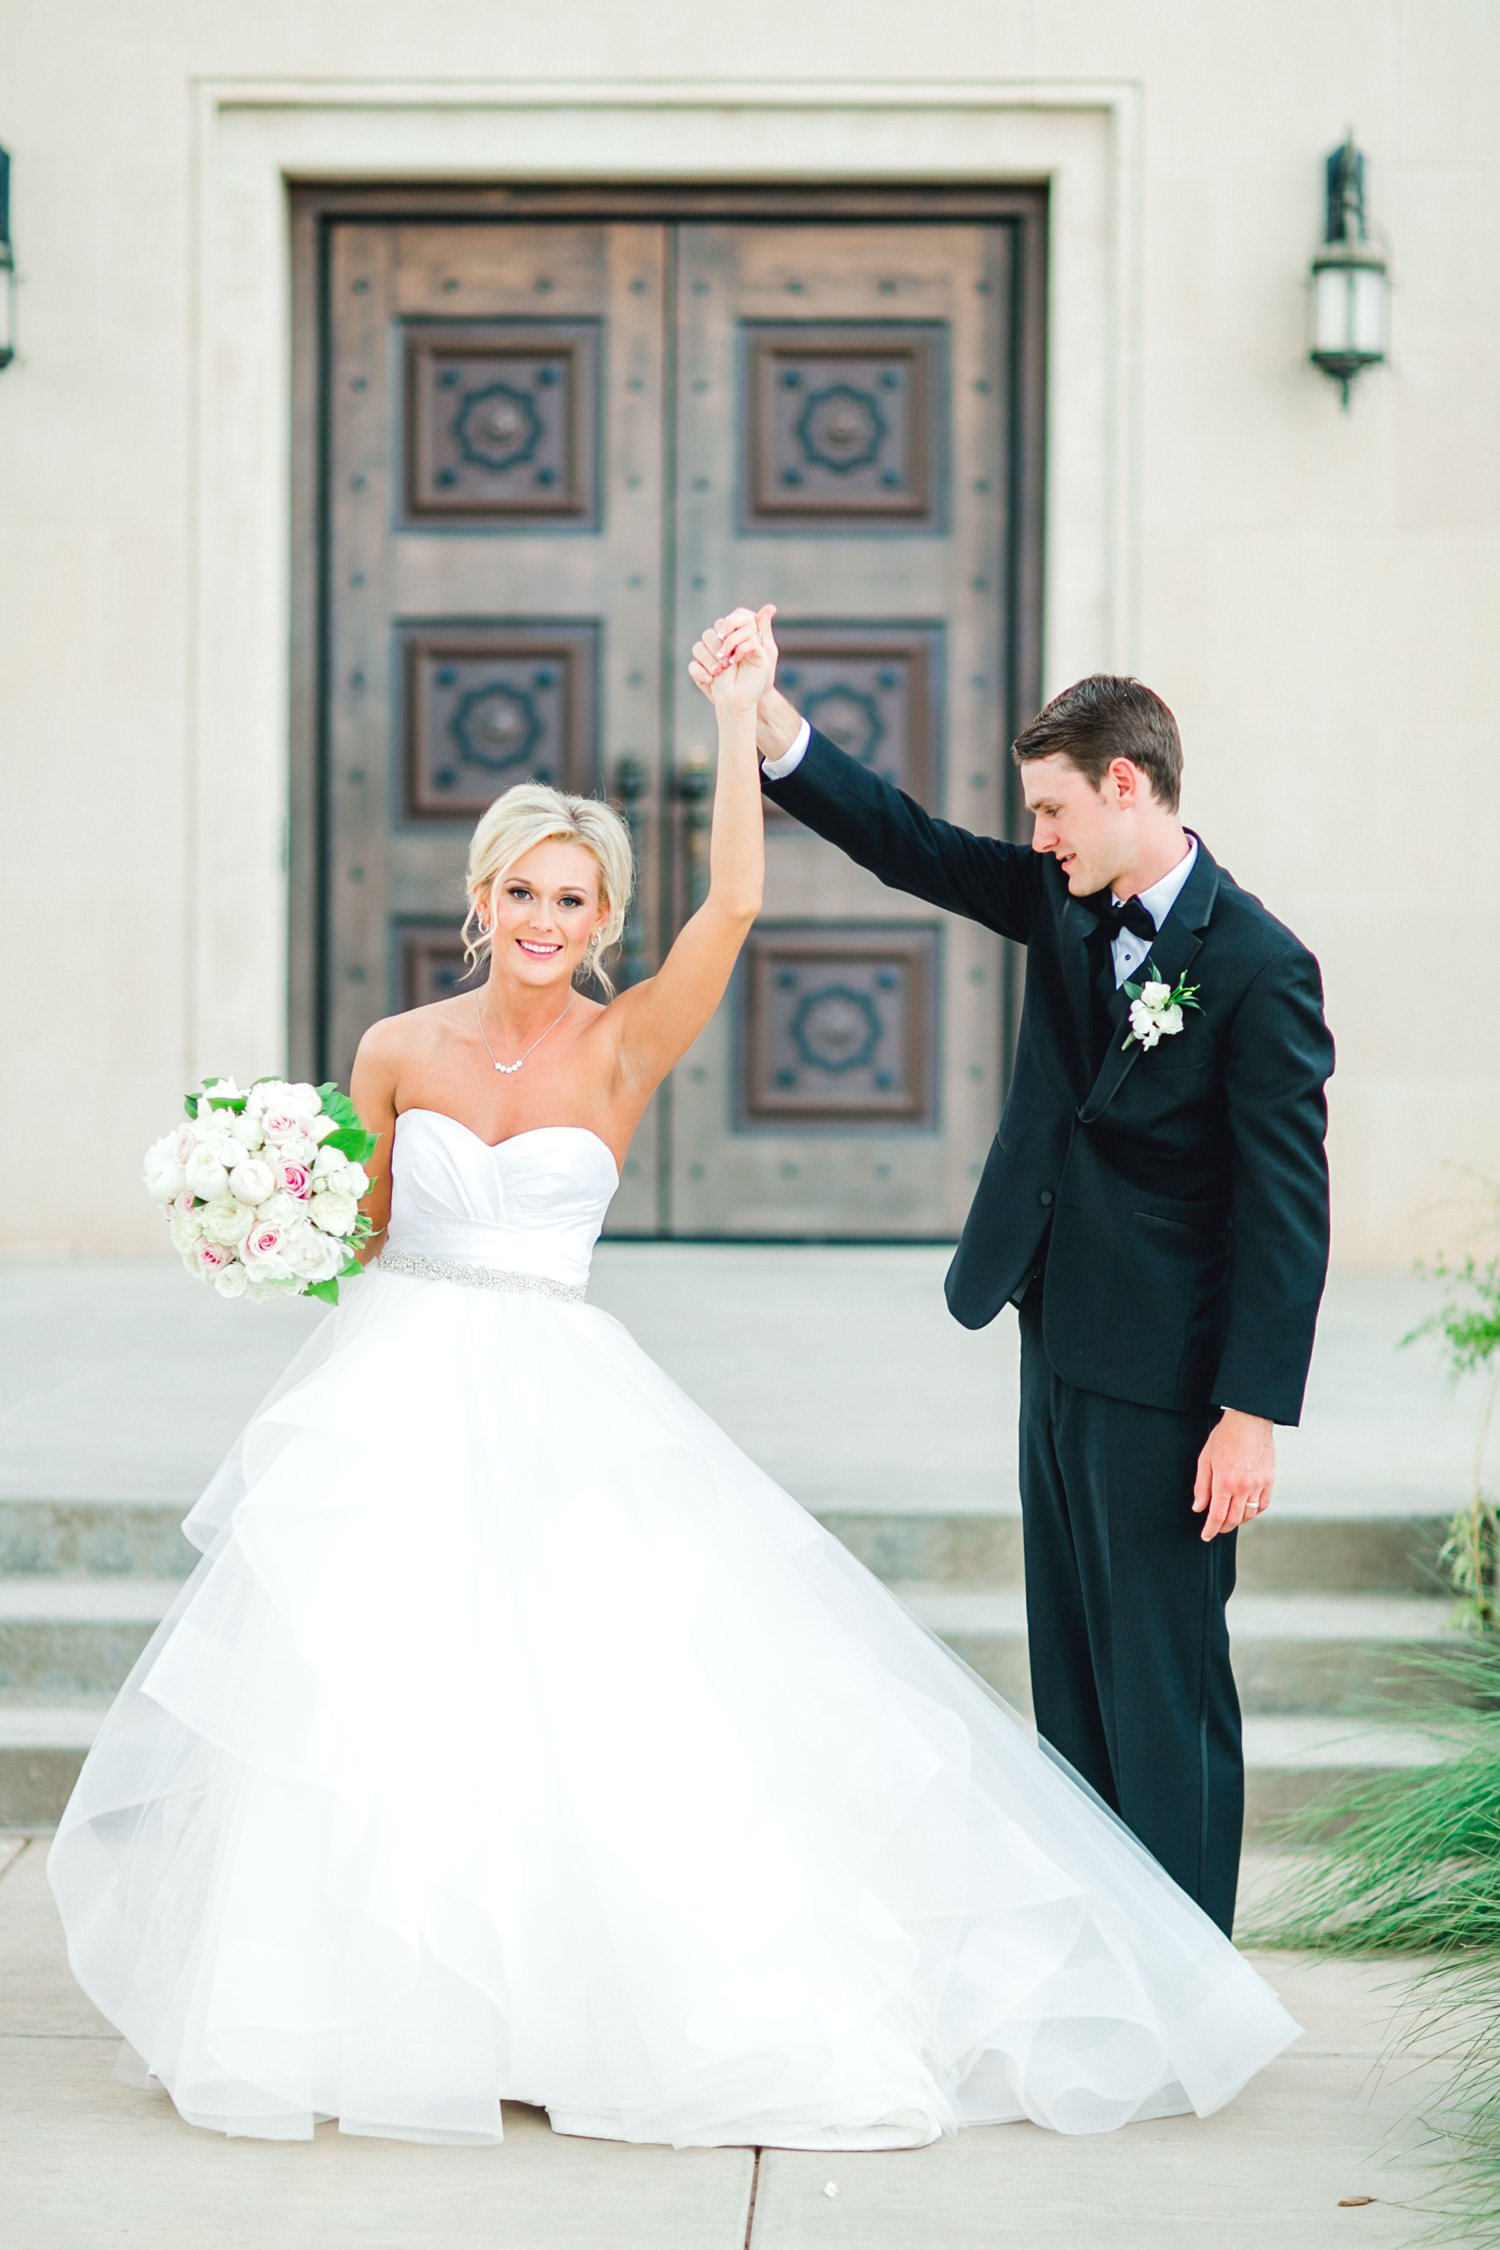 Taylor-and-Brock-Williams-Texas-Tech-University-Merket-Alumni-Center-Lubbock-Photographer-ALLEEJ0161.jpg